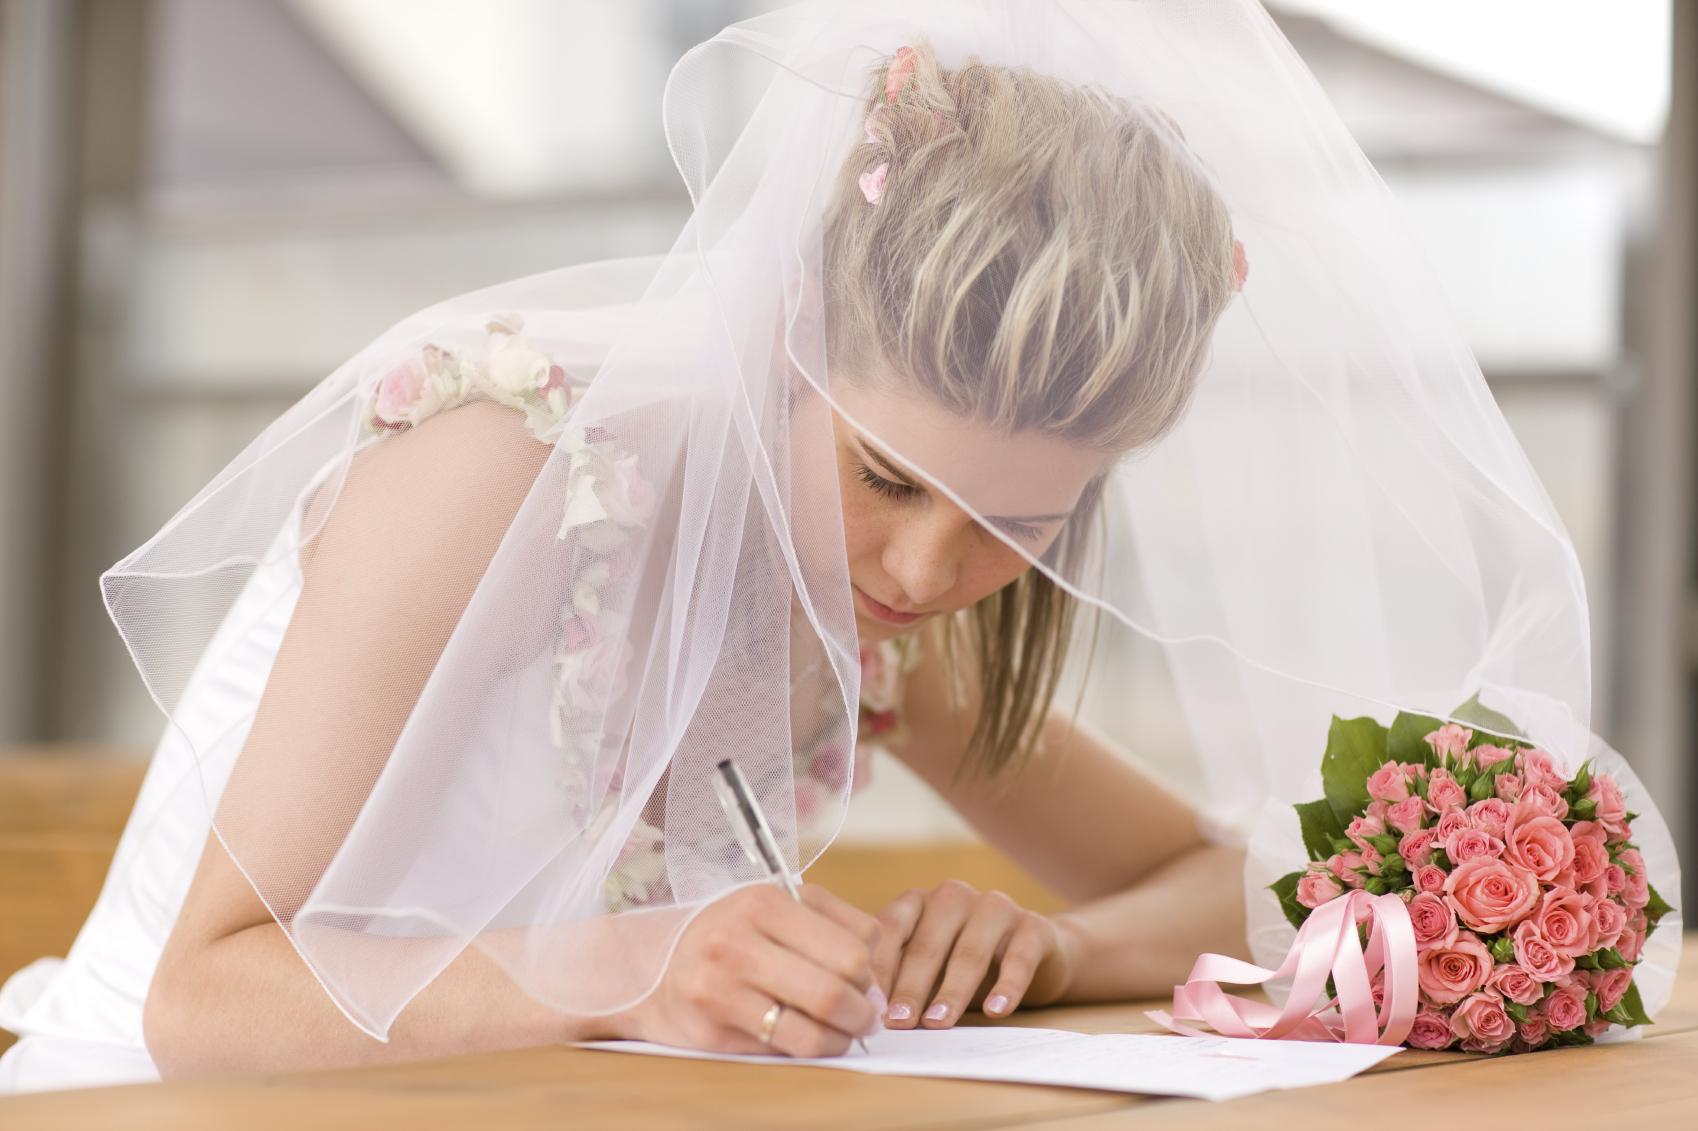 Bridal-Registry-Photo Как получиться красиво на фото в ЗАГСе